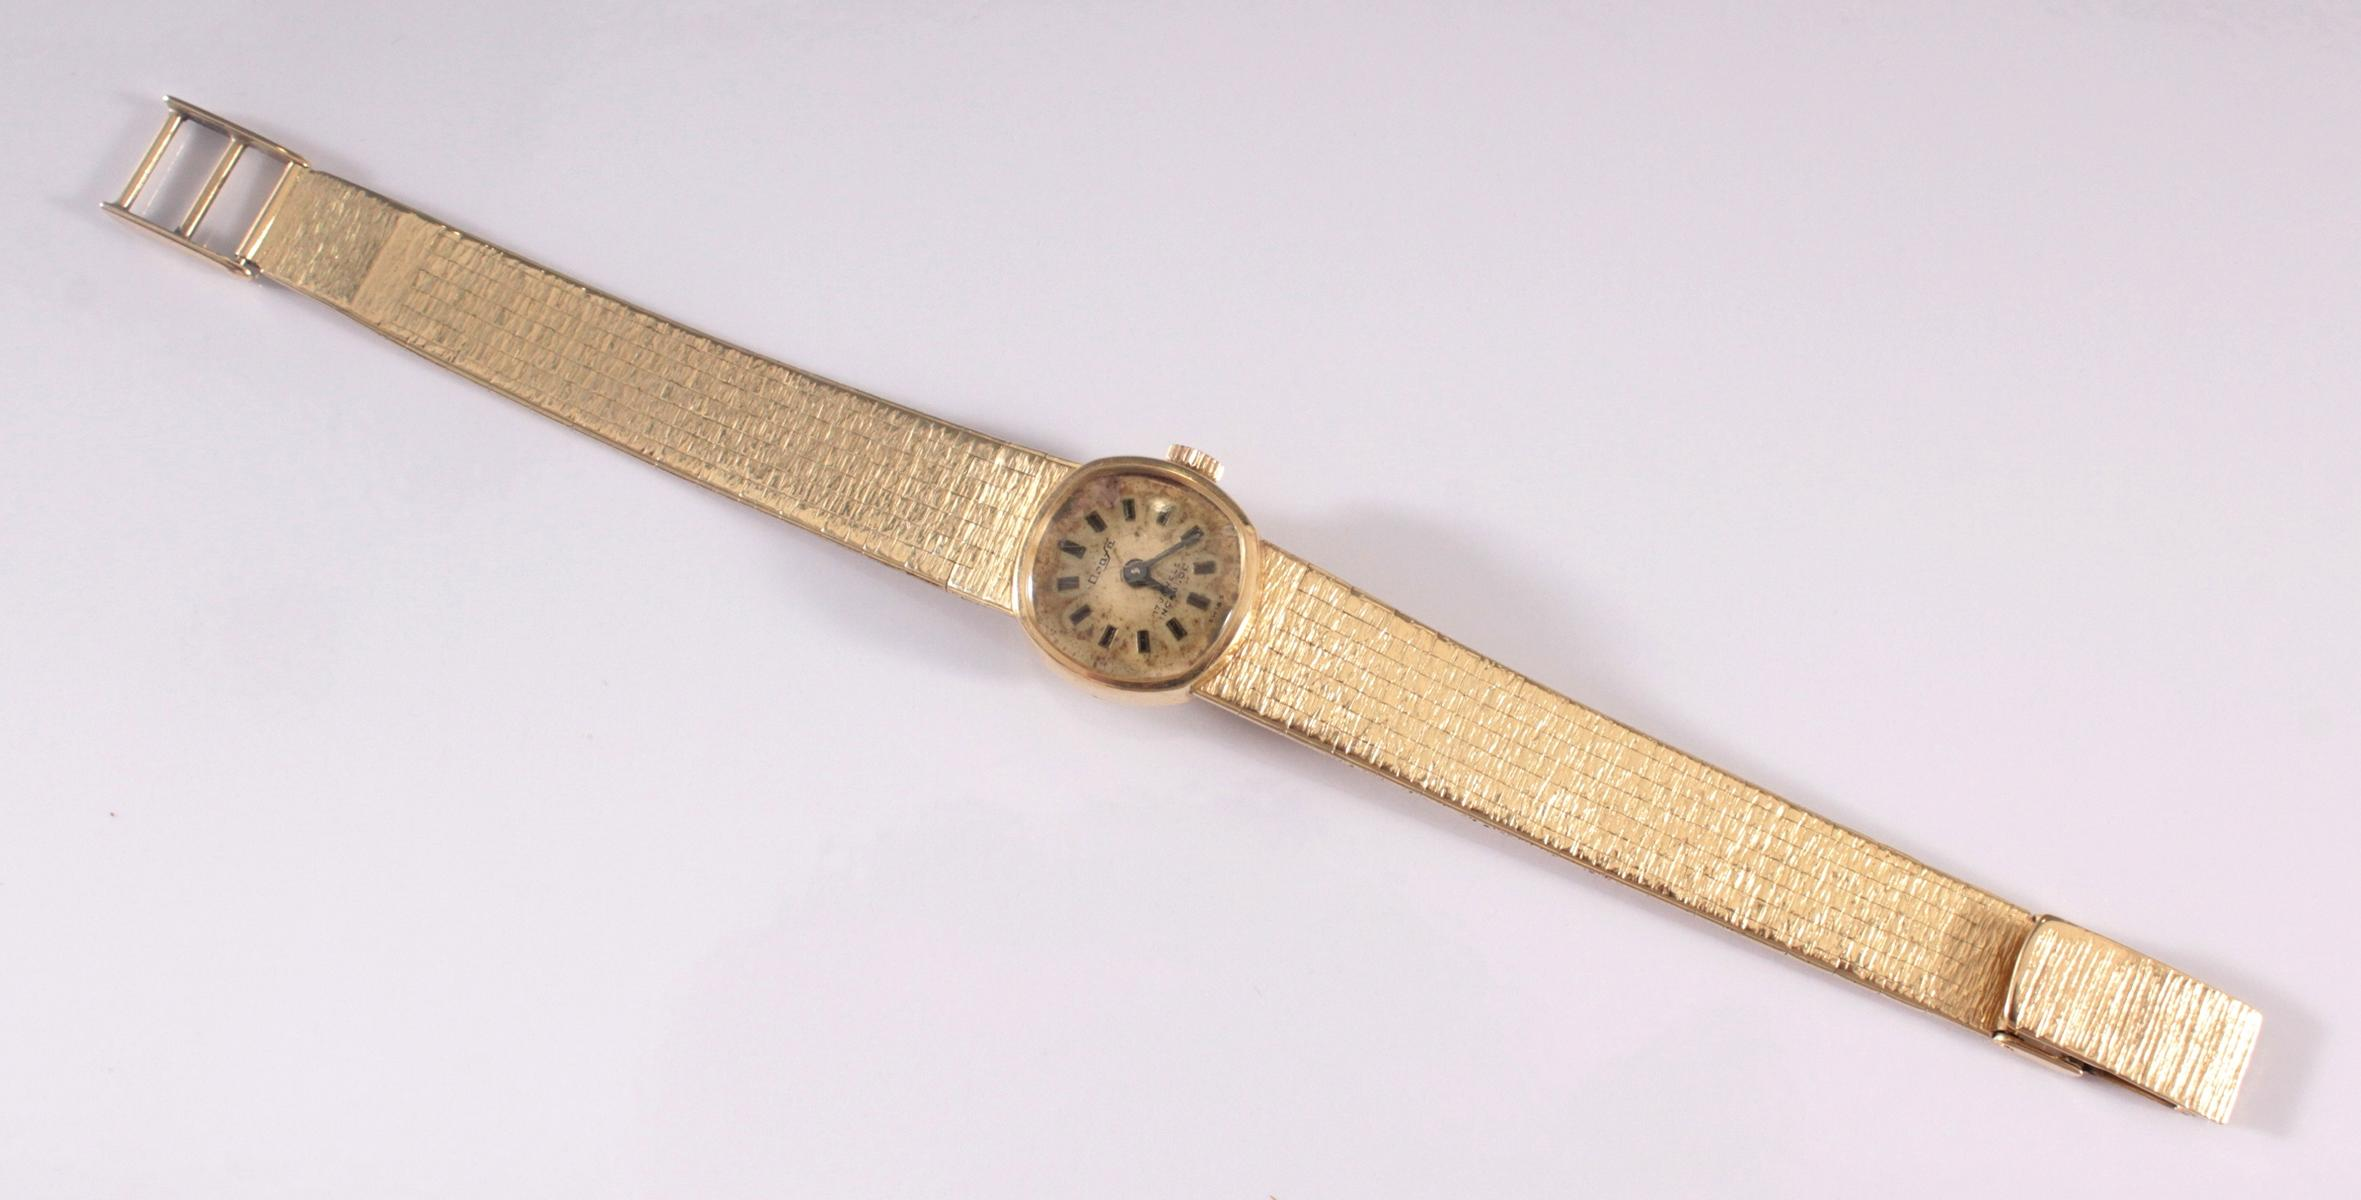 Damenarmbanduhr der Marke Drafa aus 14 Karat Gelbgold